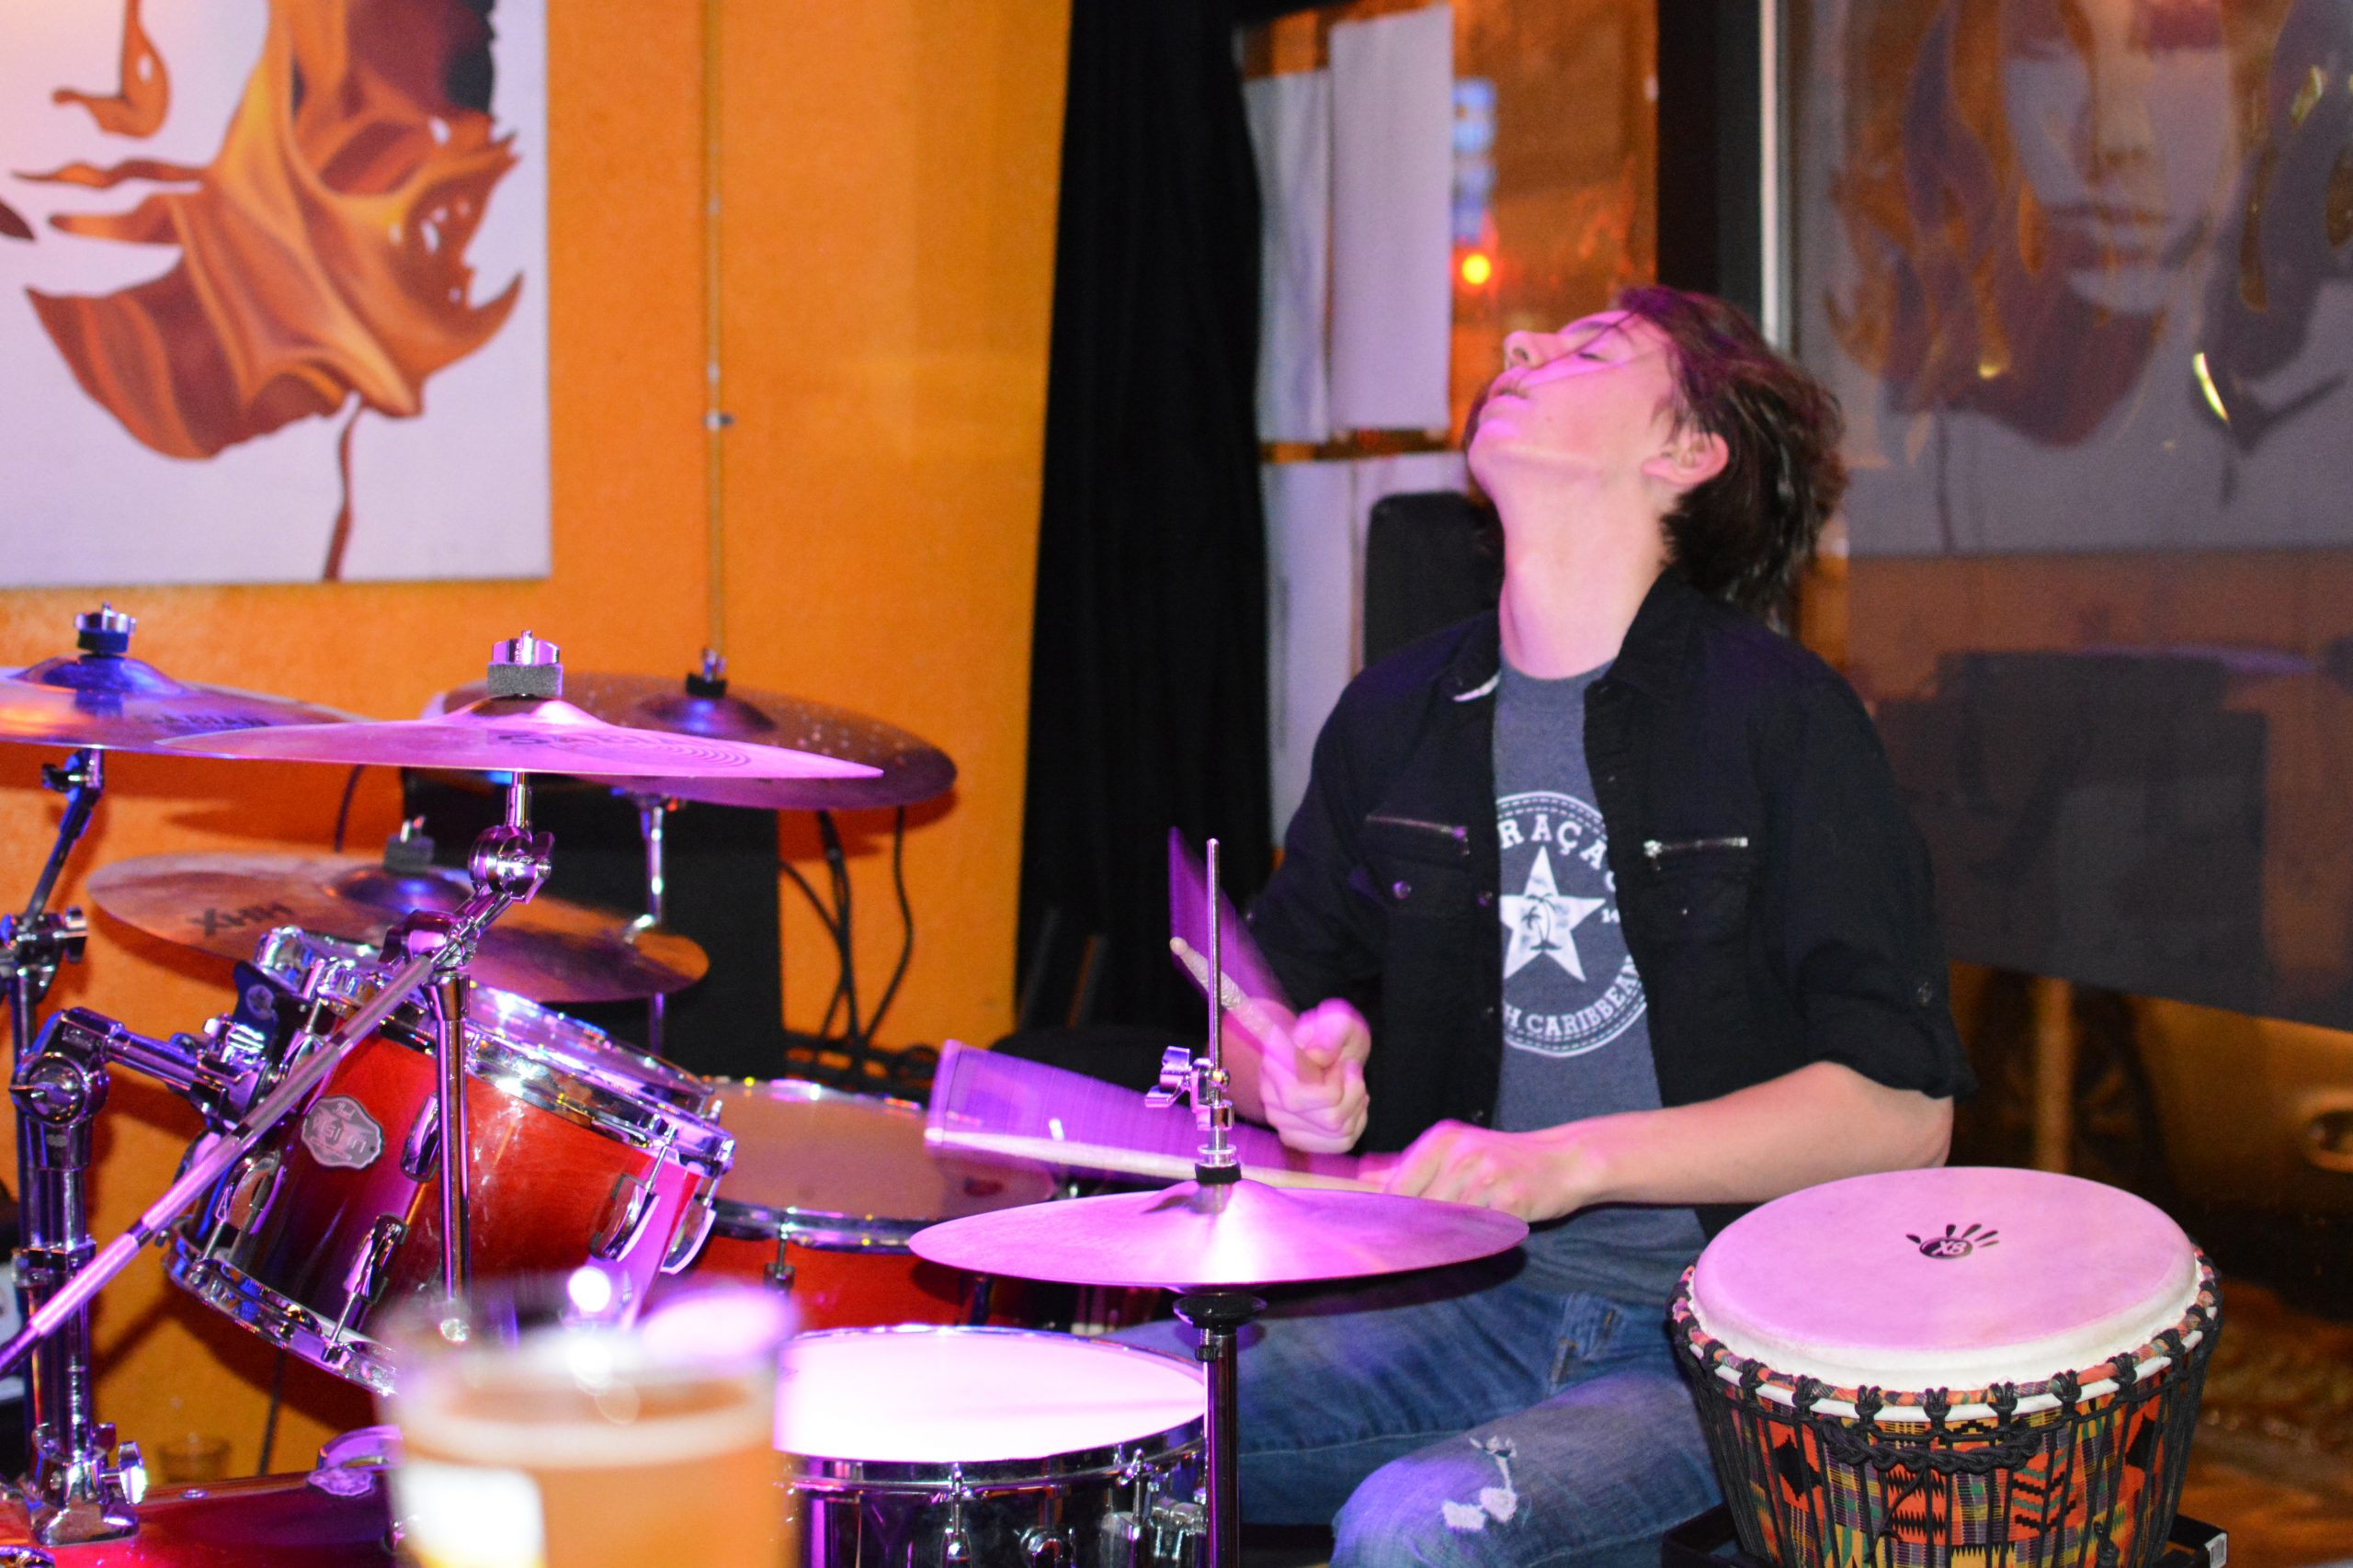 Max Bird plays the drum kit